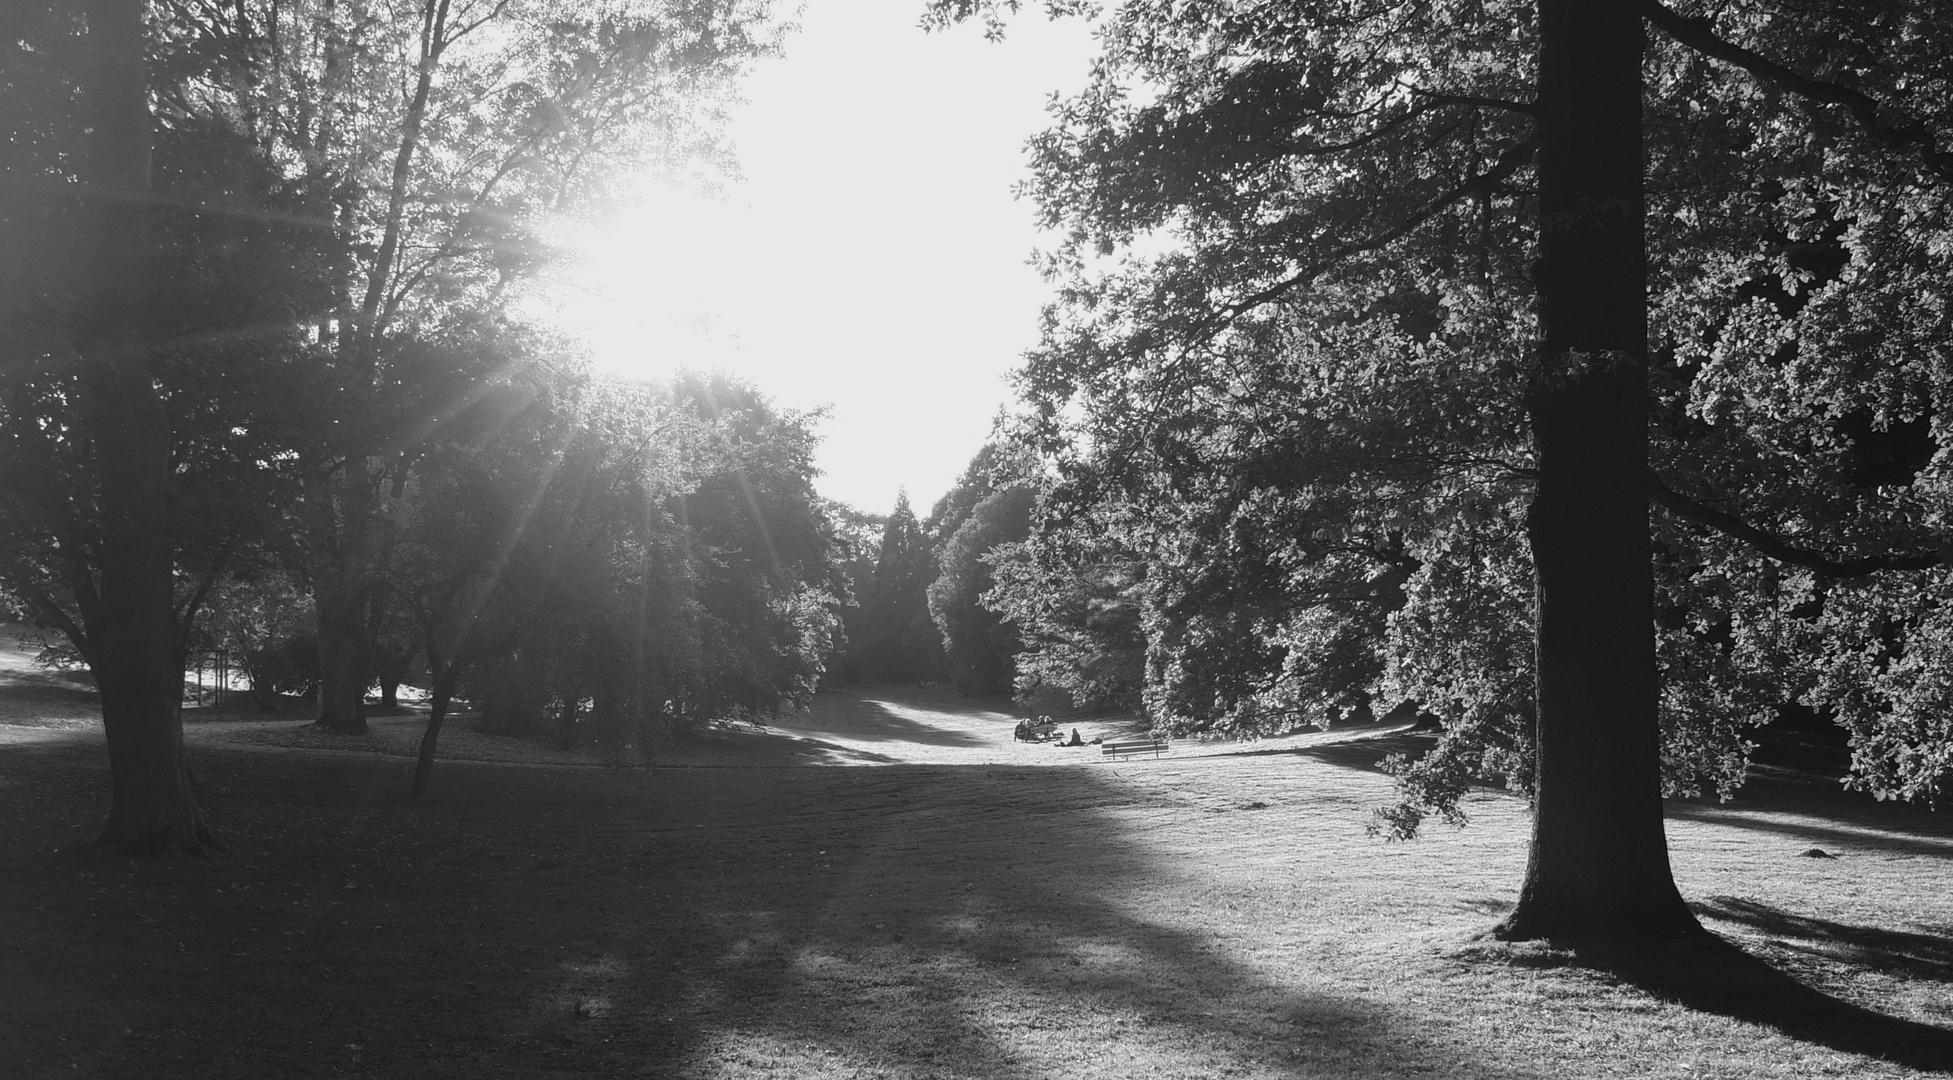 Seasons in the park